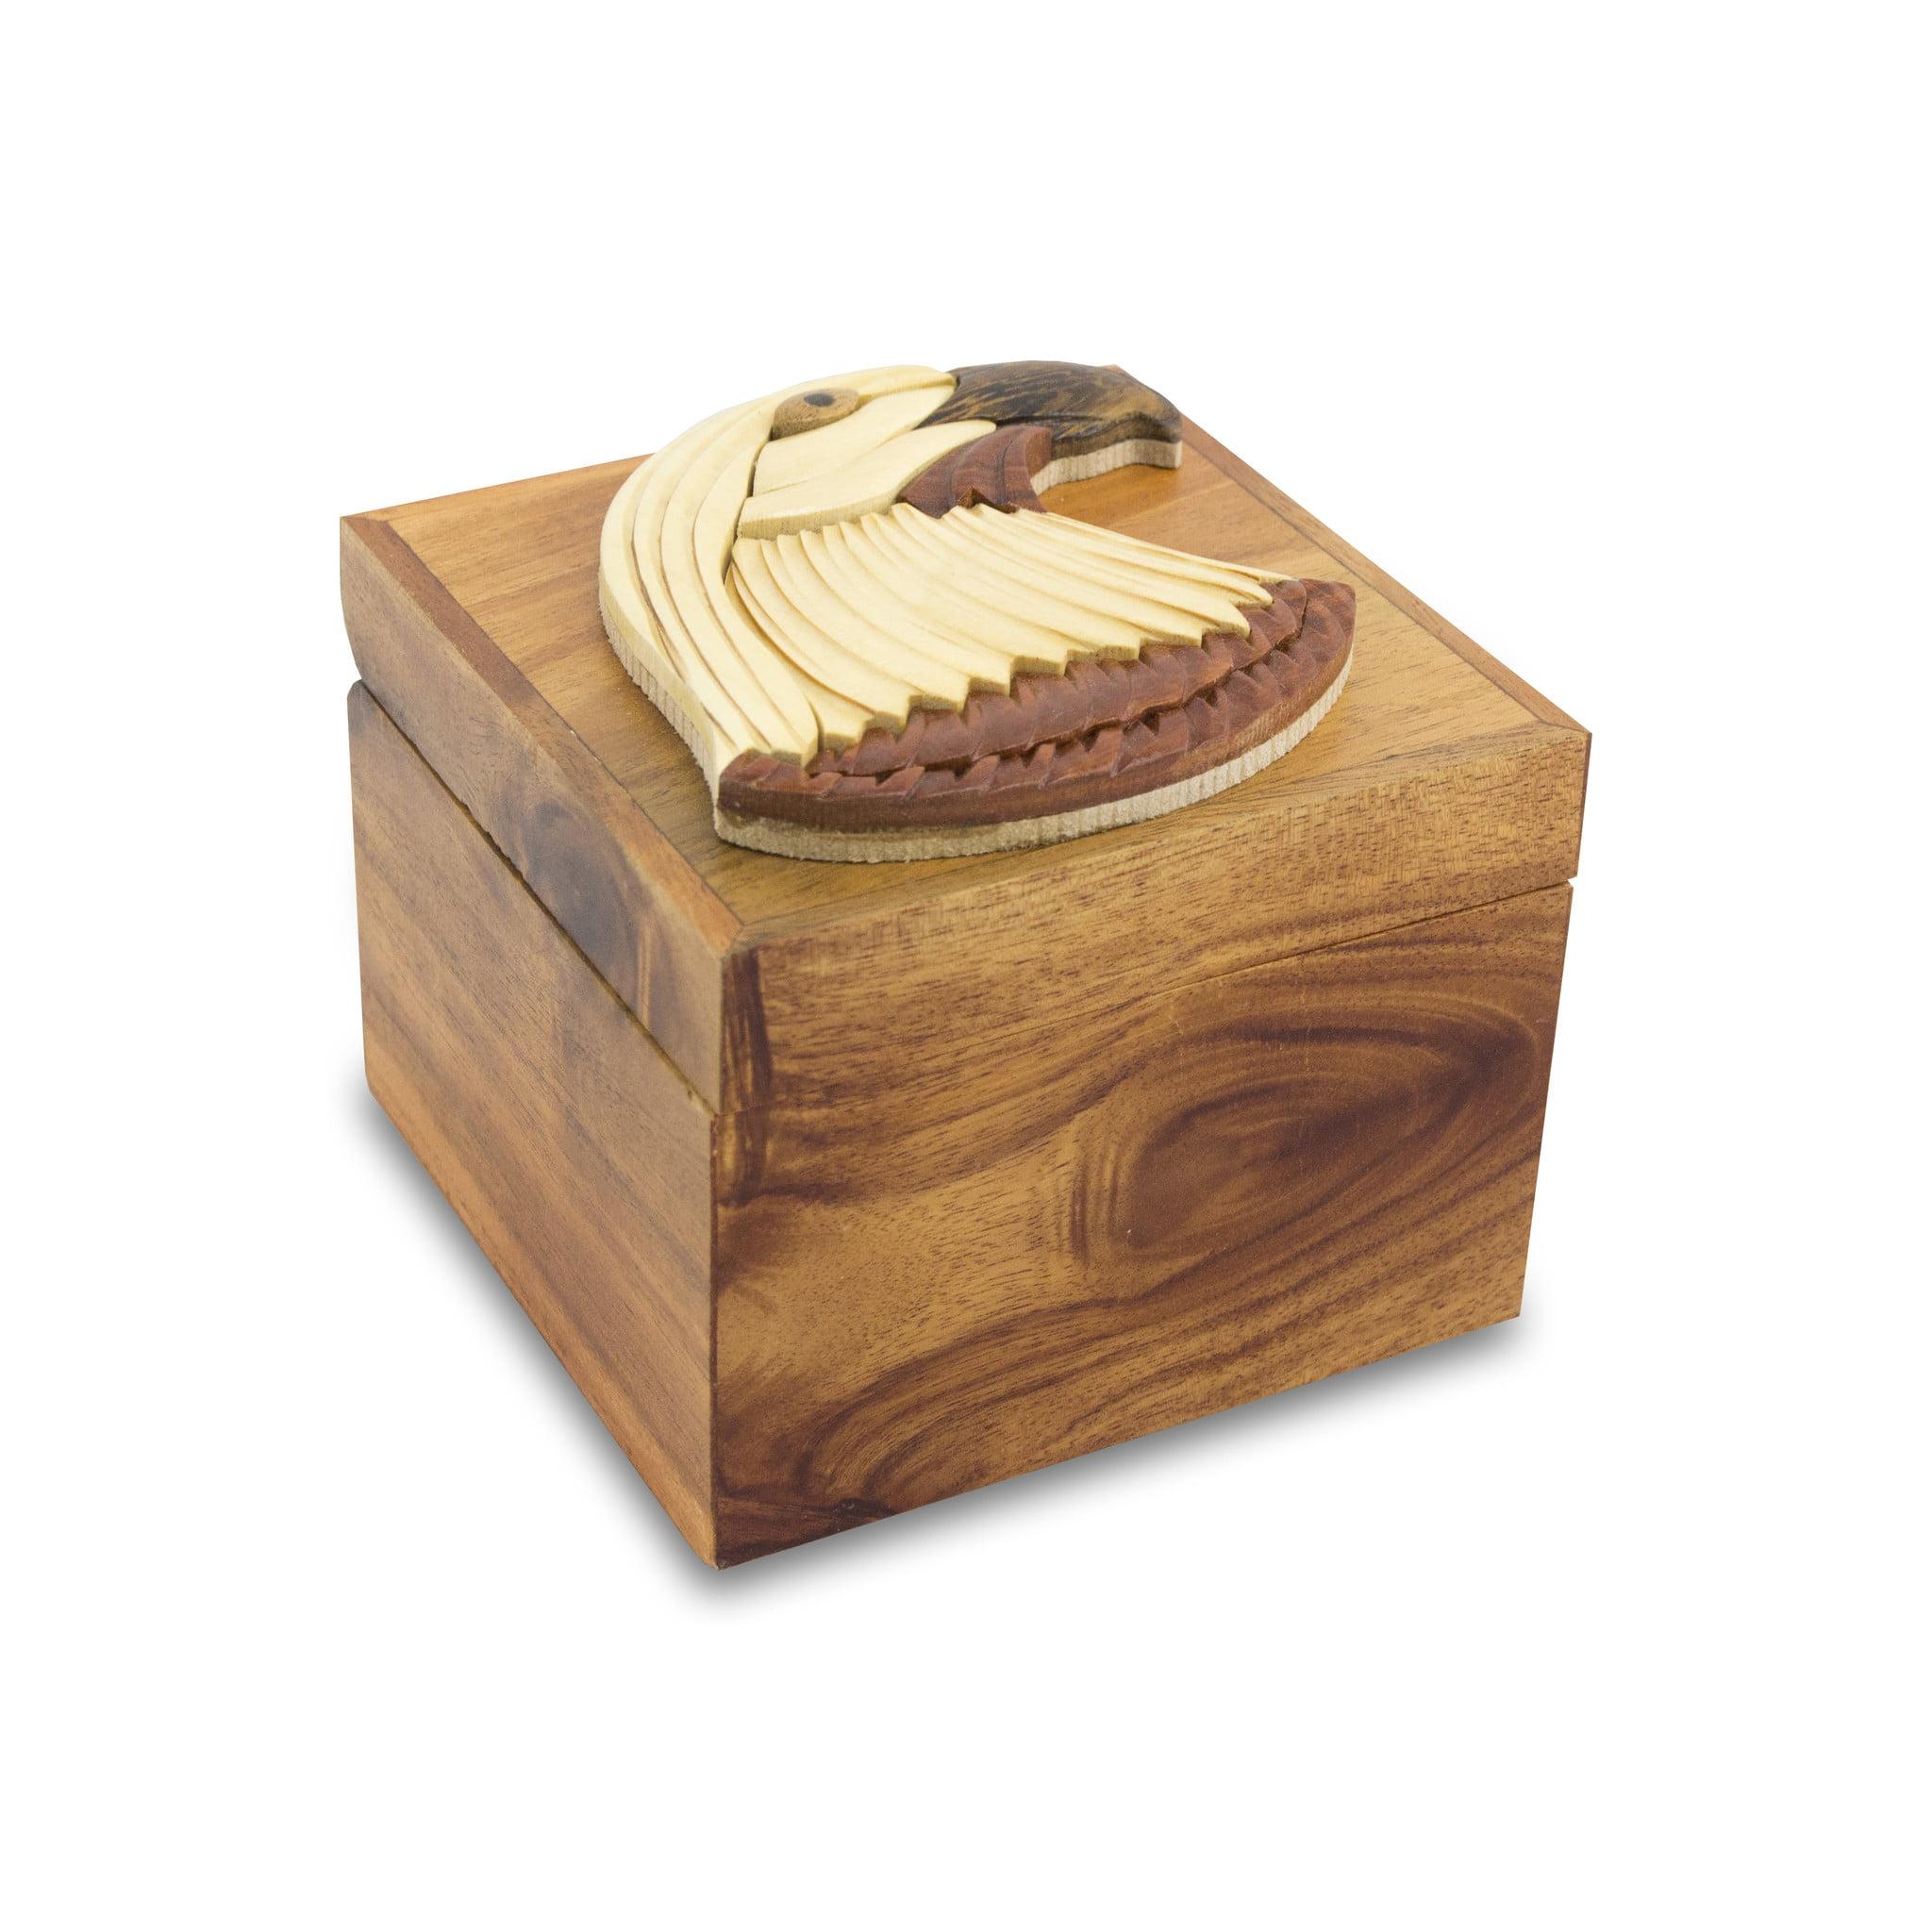 NEW! Intarsia Wood Cremation Keepsake Box - Patriotic Eagle